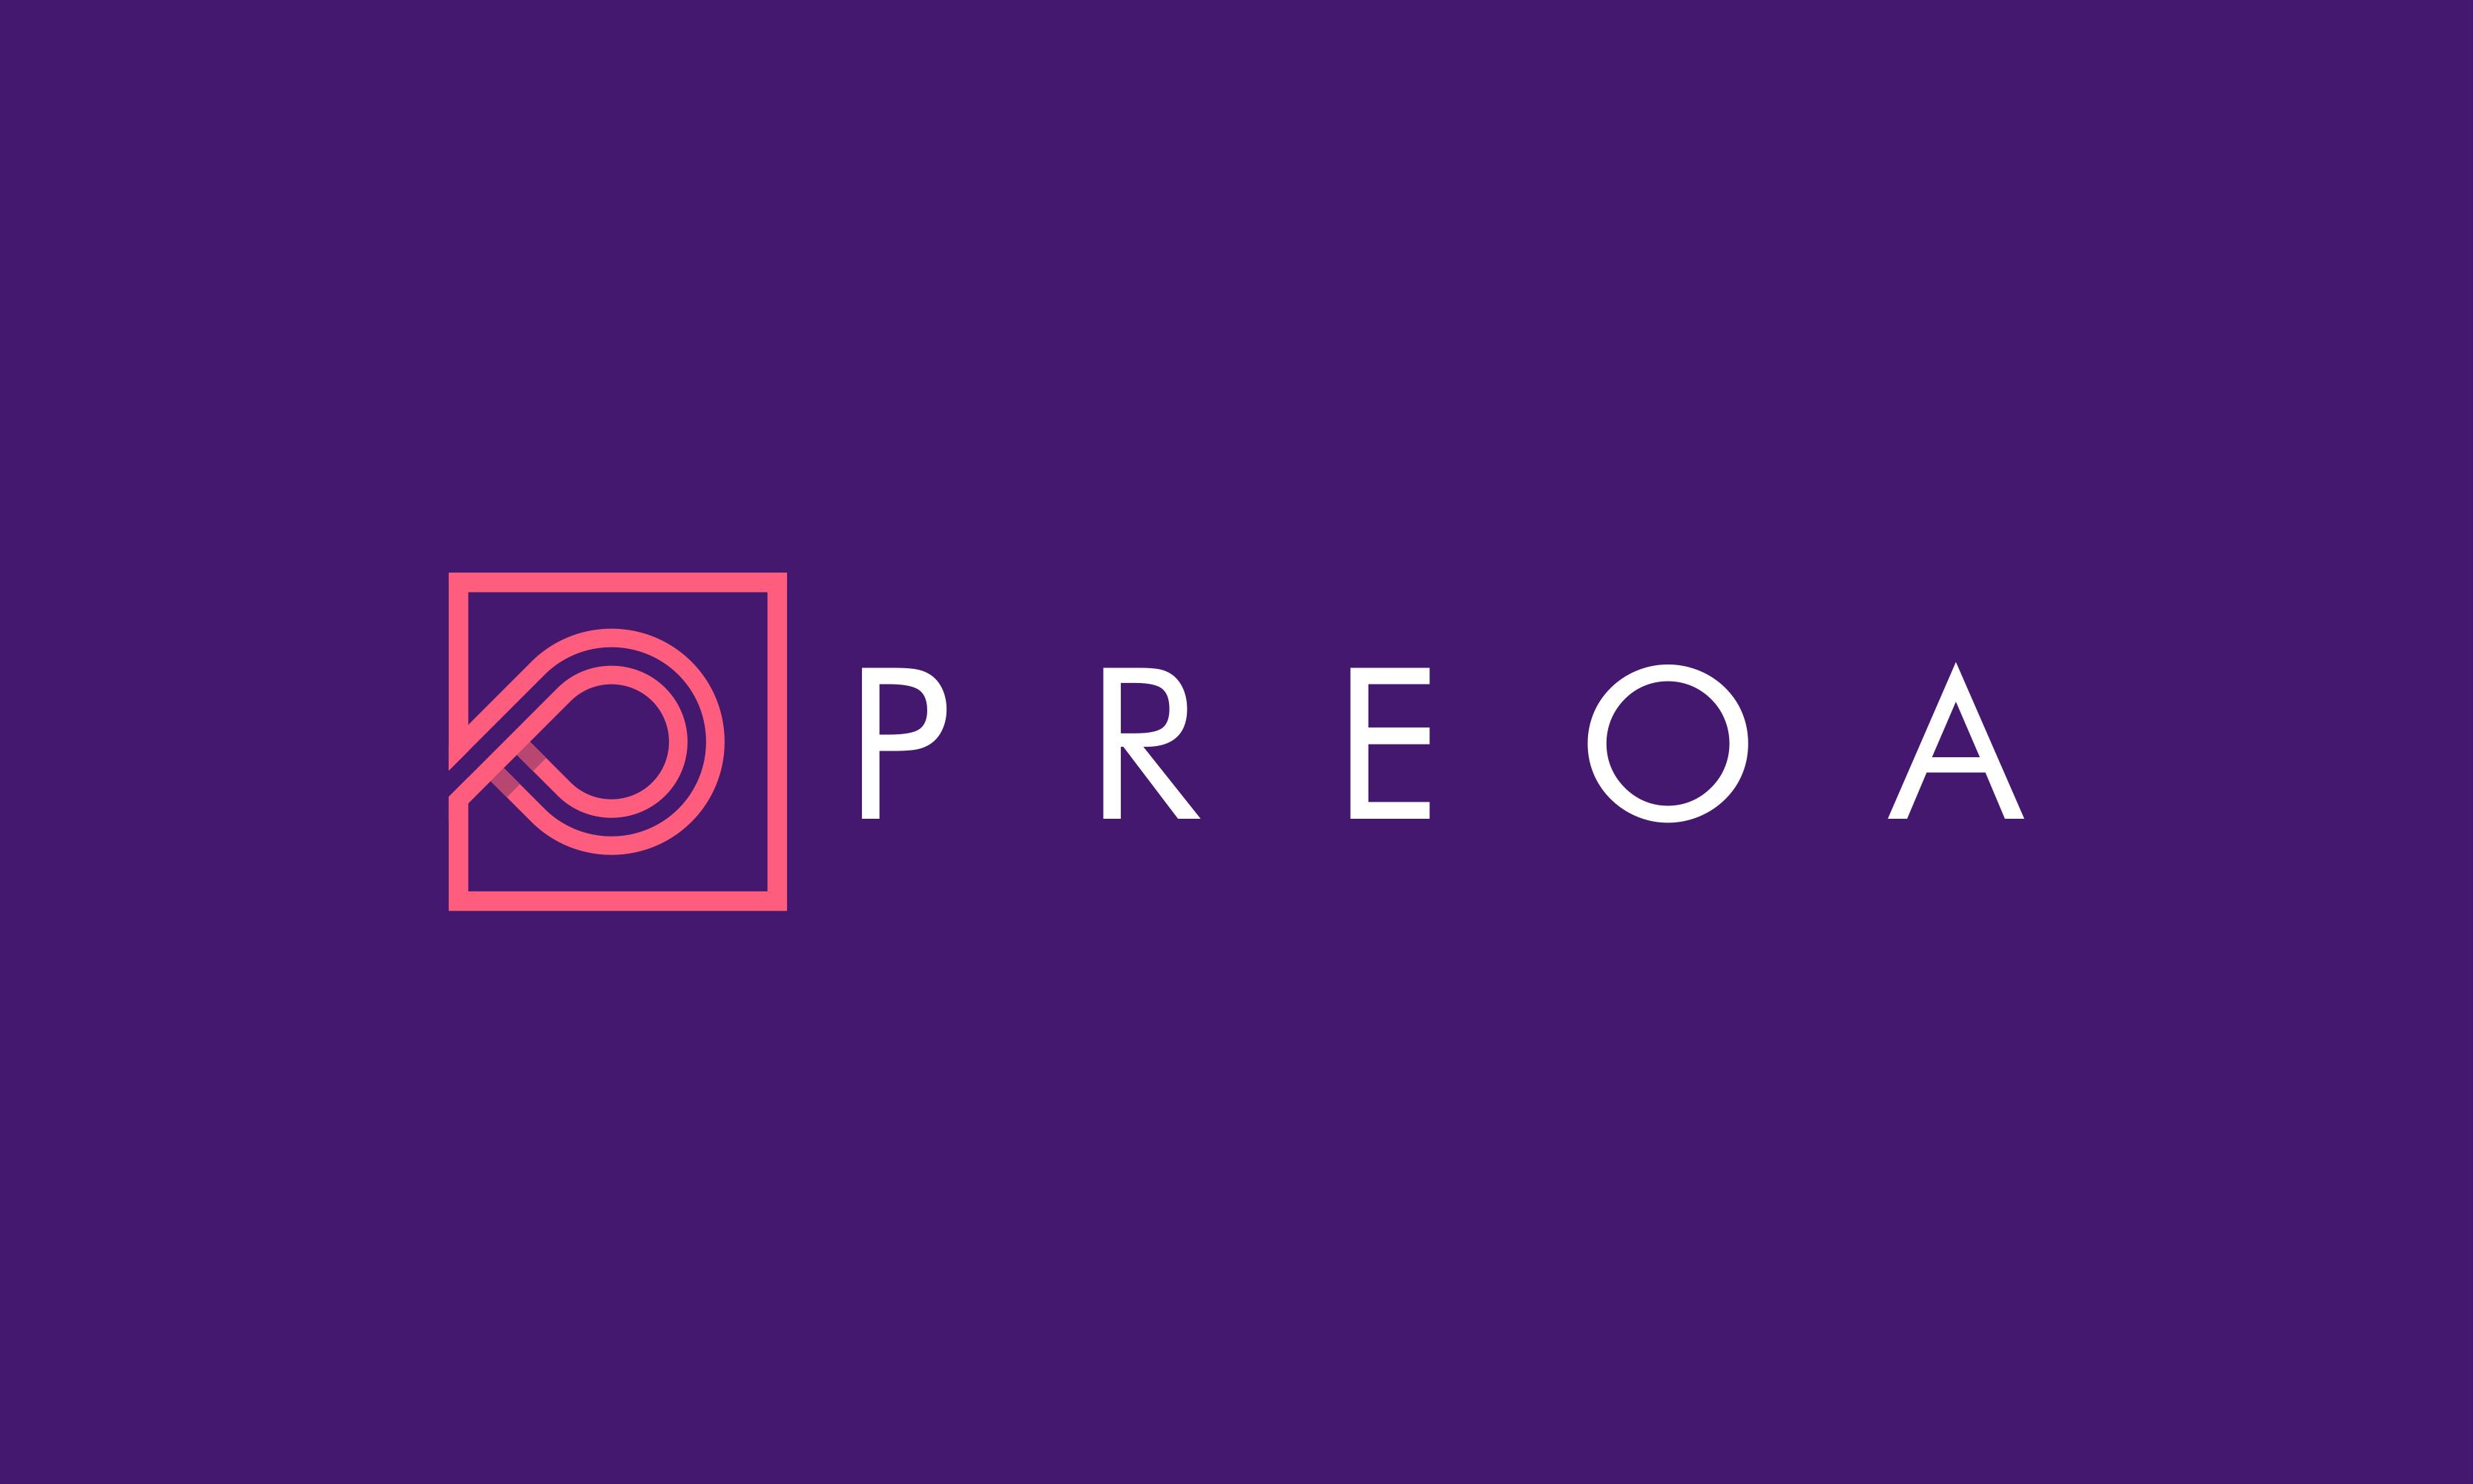 Preoa